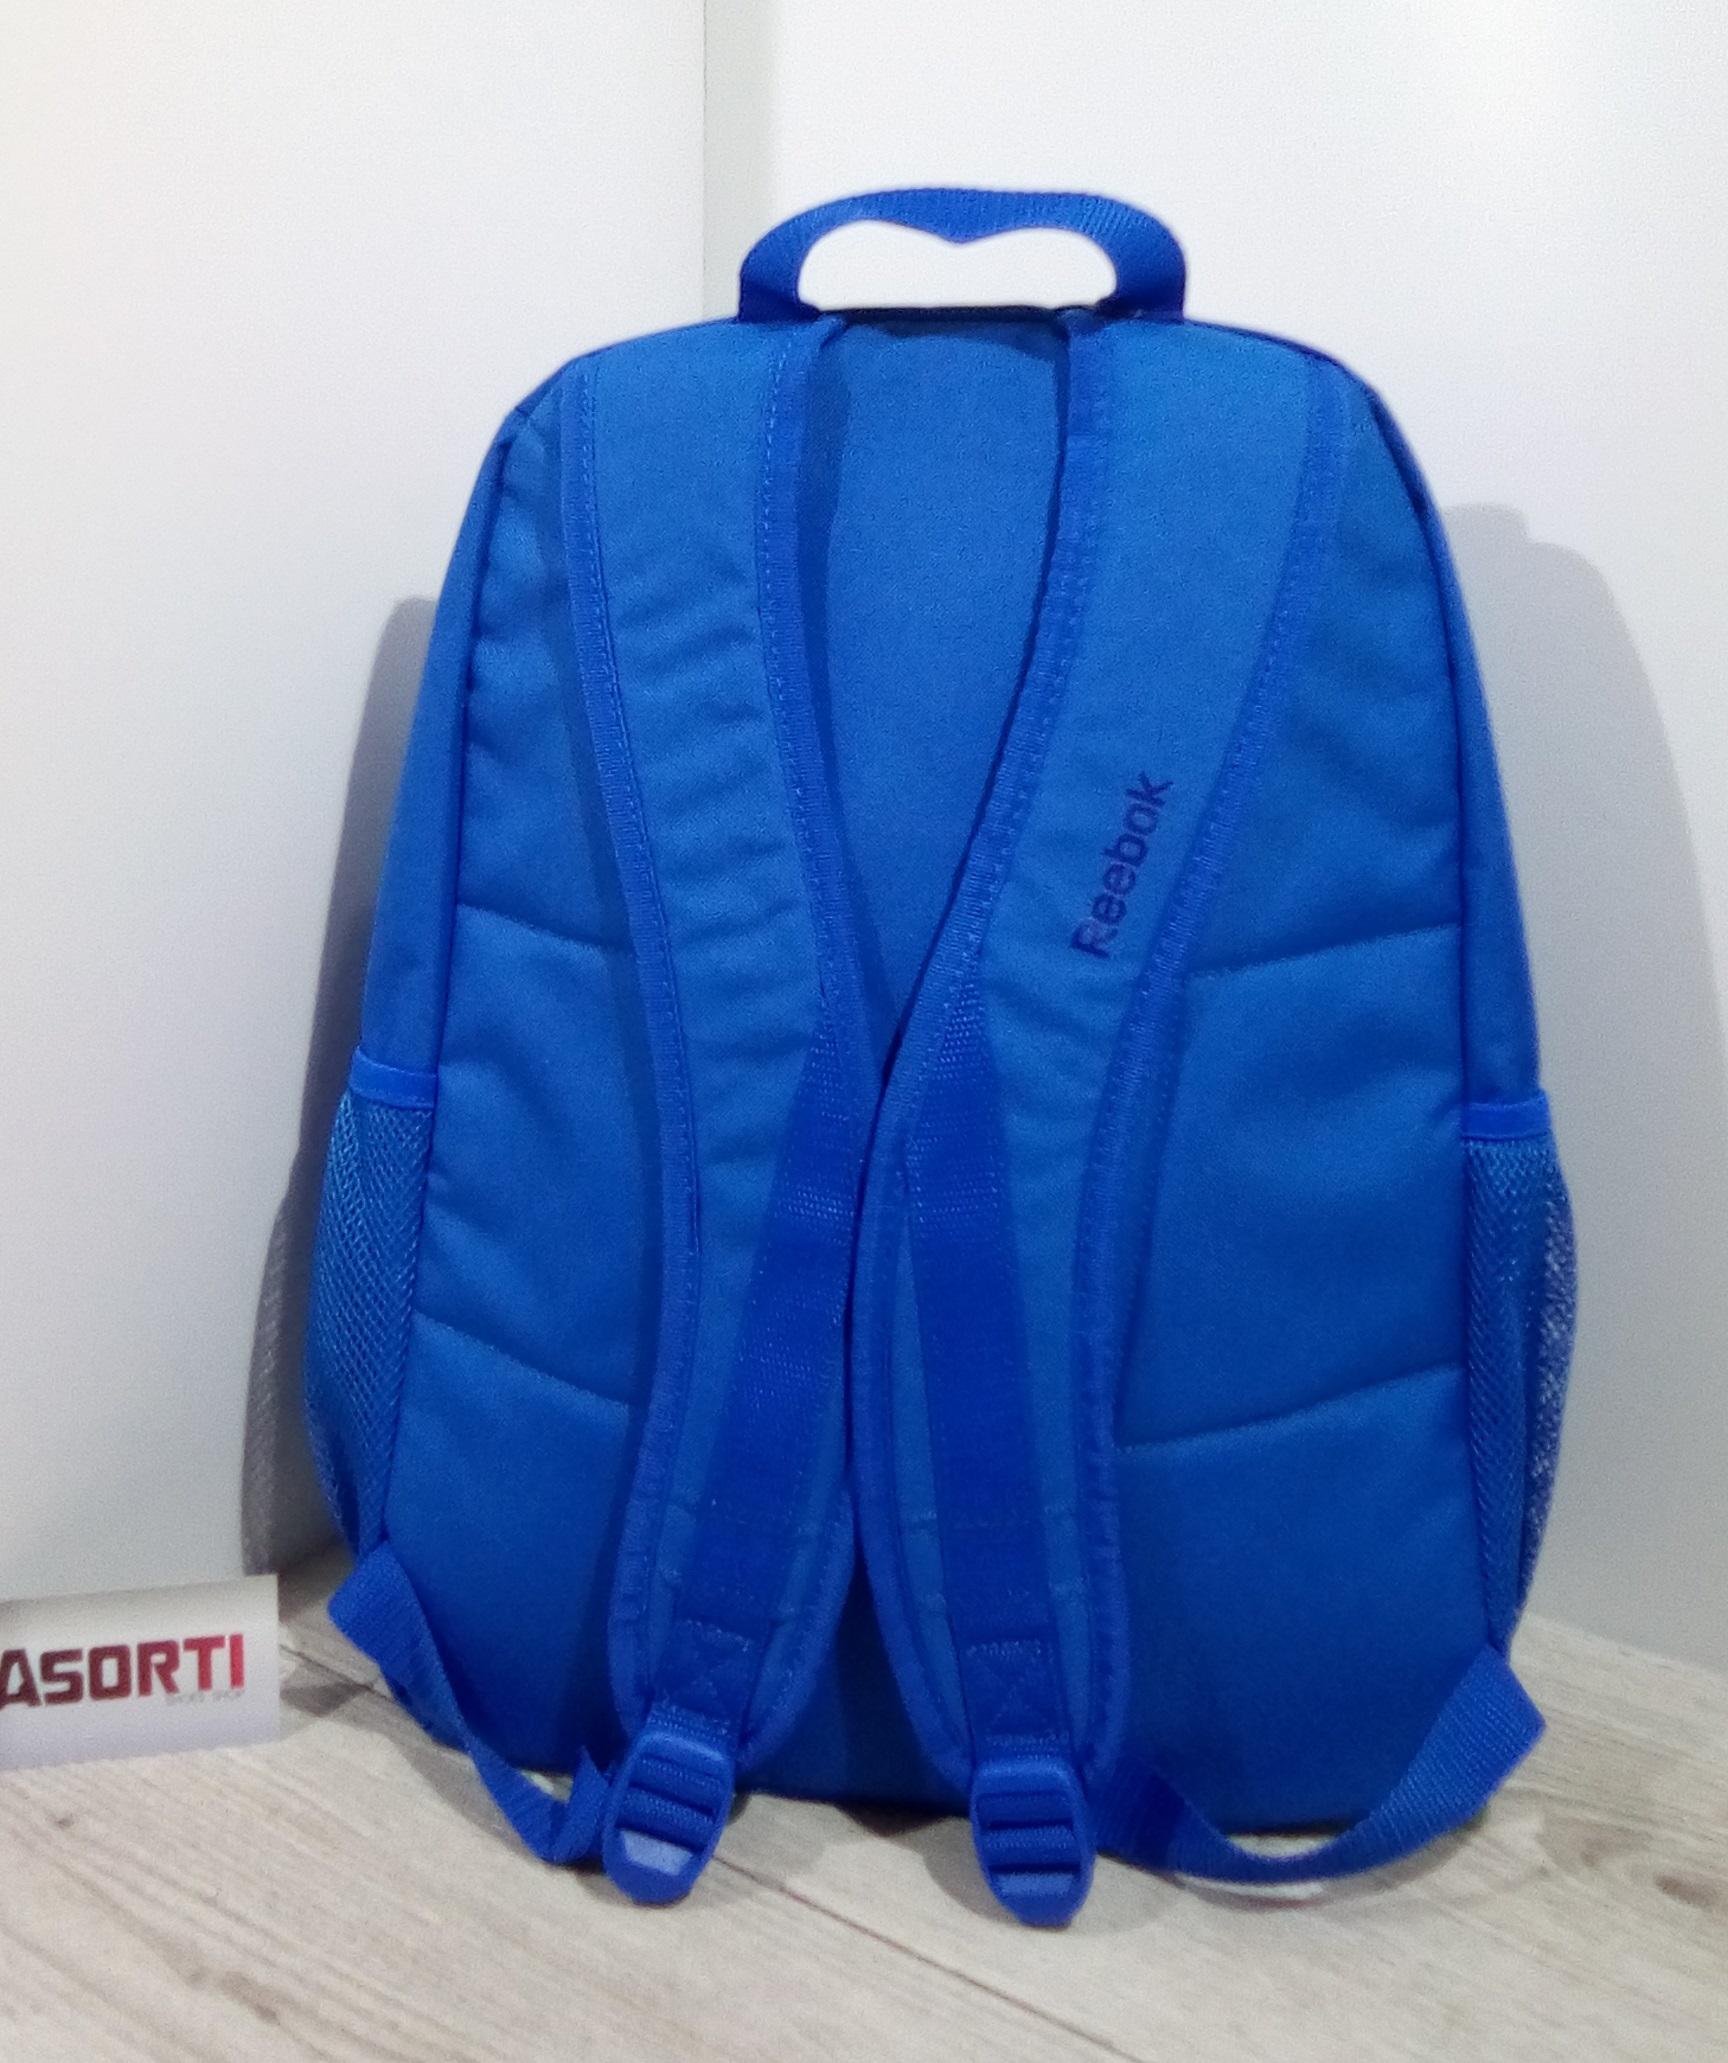 132172a2b8c703 Мужской спортивный рюкзак Reebok Sport Royal (BQ1231) синий купить в ...